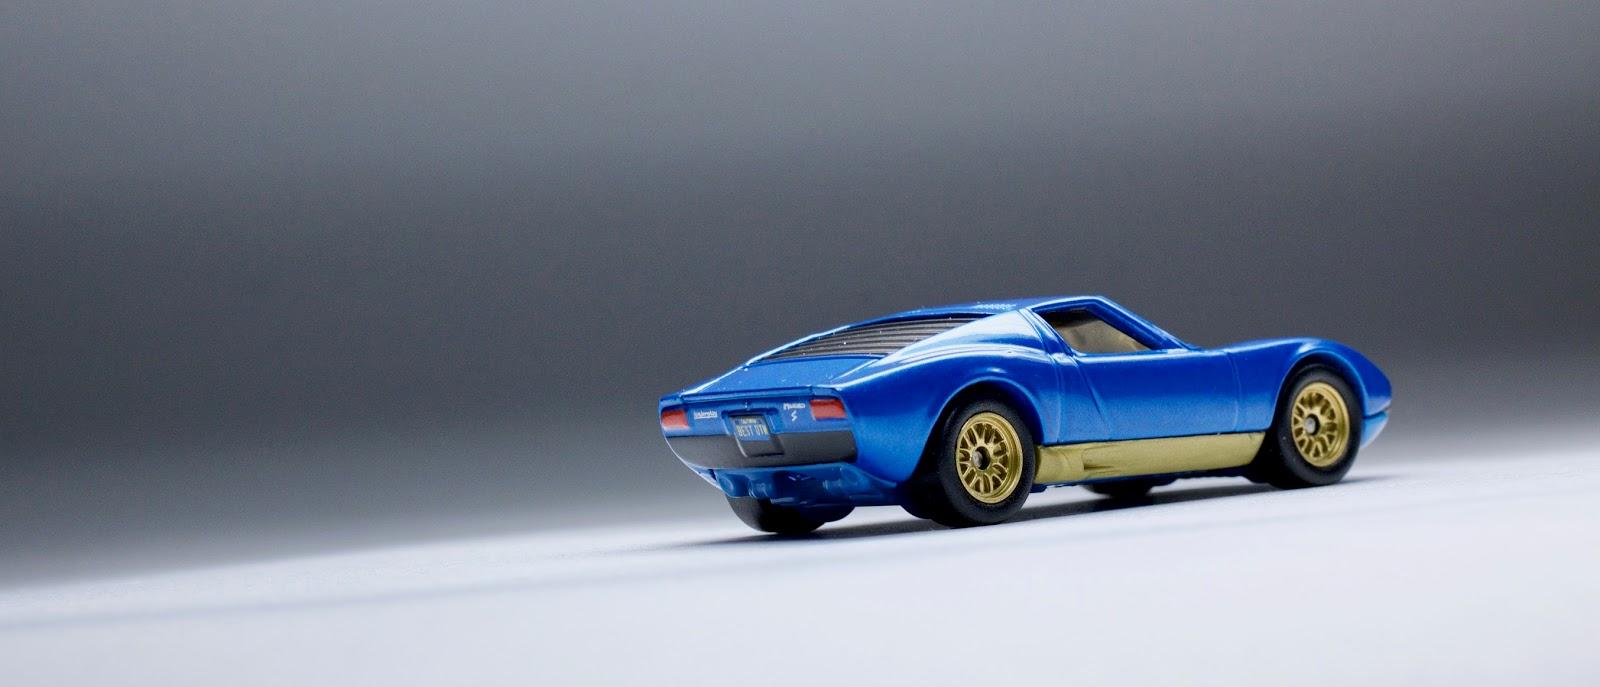 A Complete Look At The Matchbox Lamborghini Miura With Its Designer